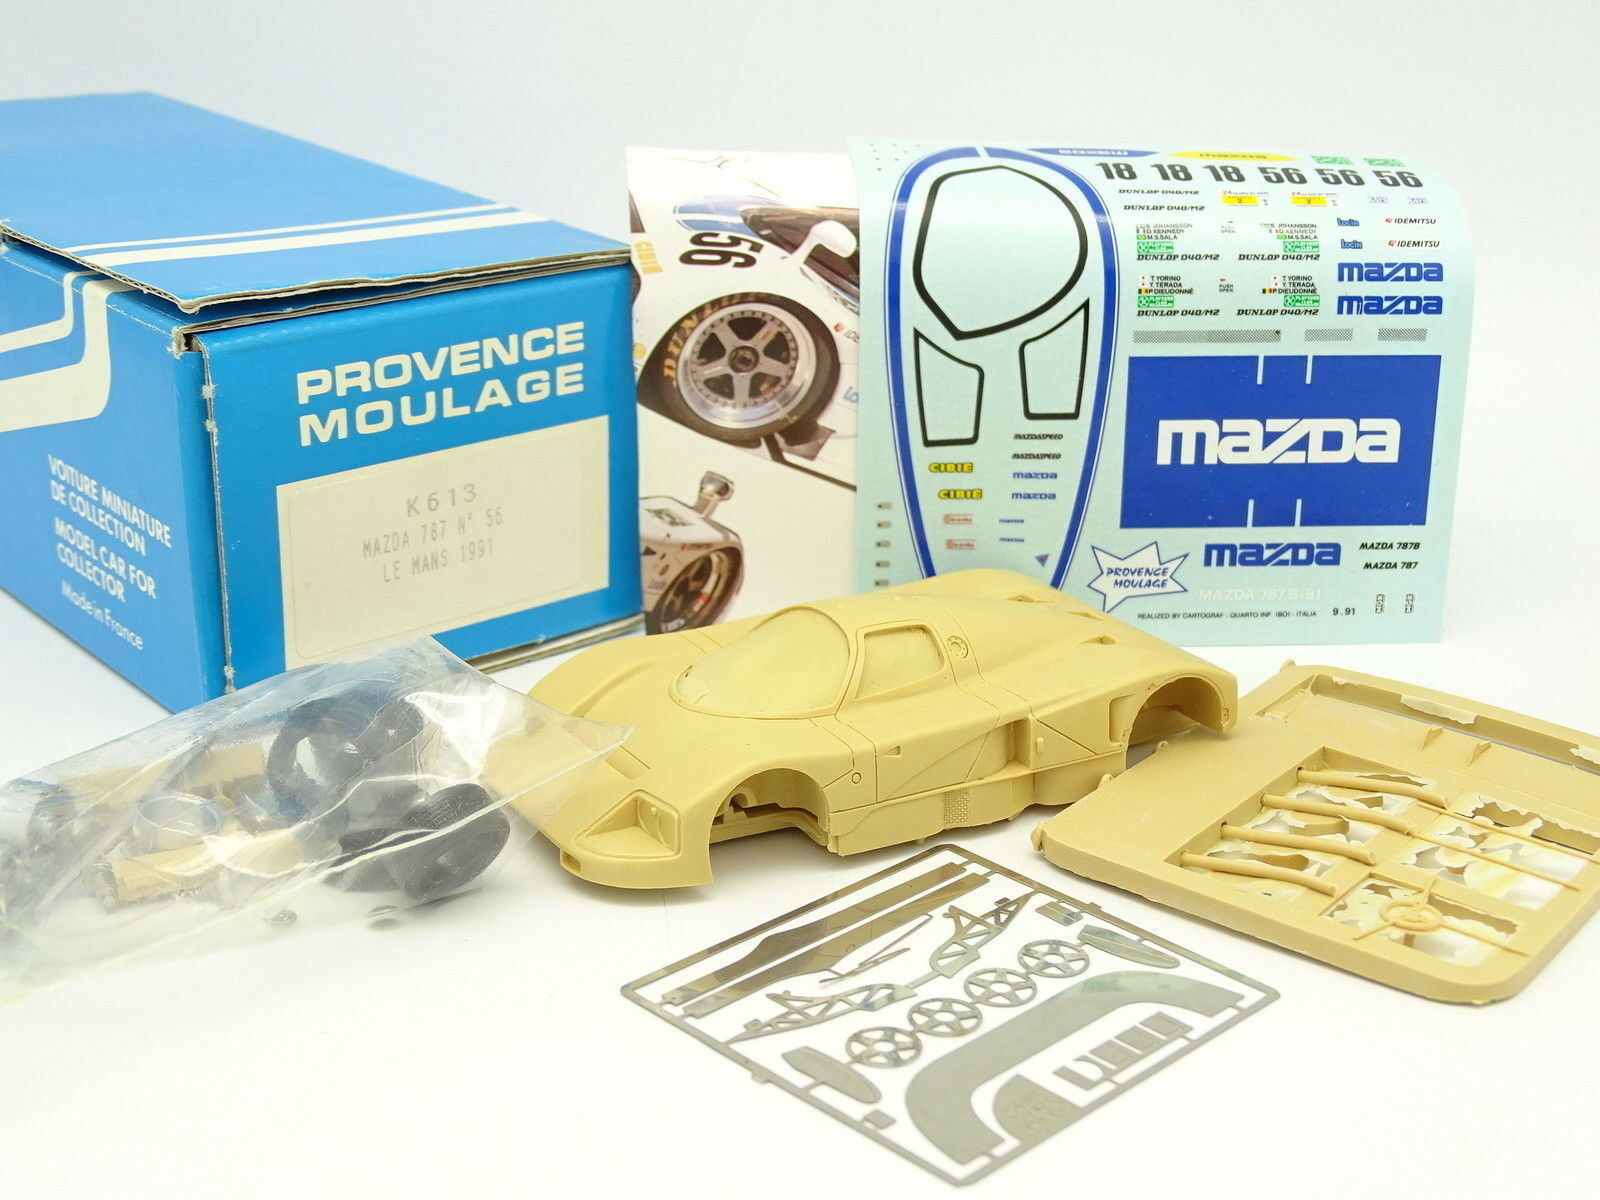 Provence moulage kit to mount 1 43 - mazda 787 no. 56 le mans 1991